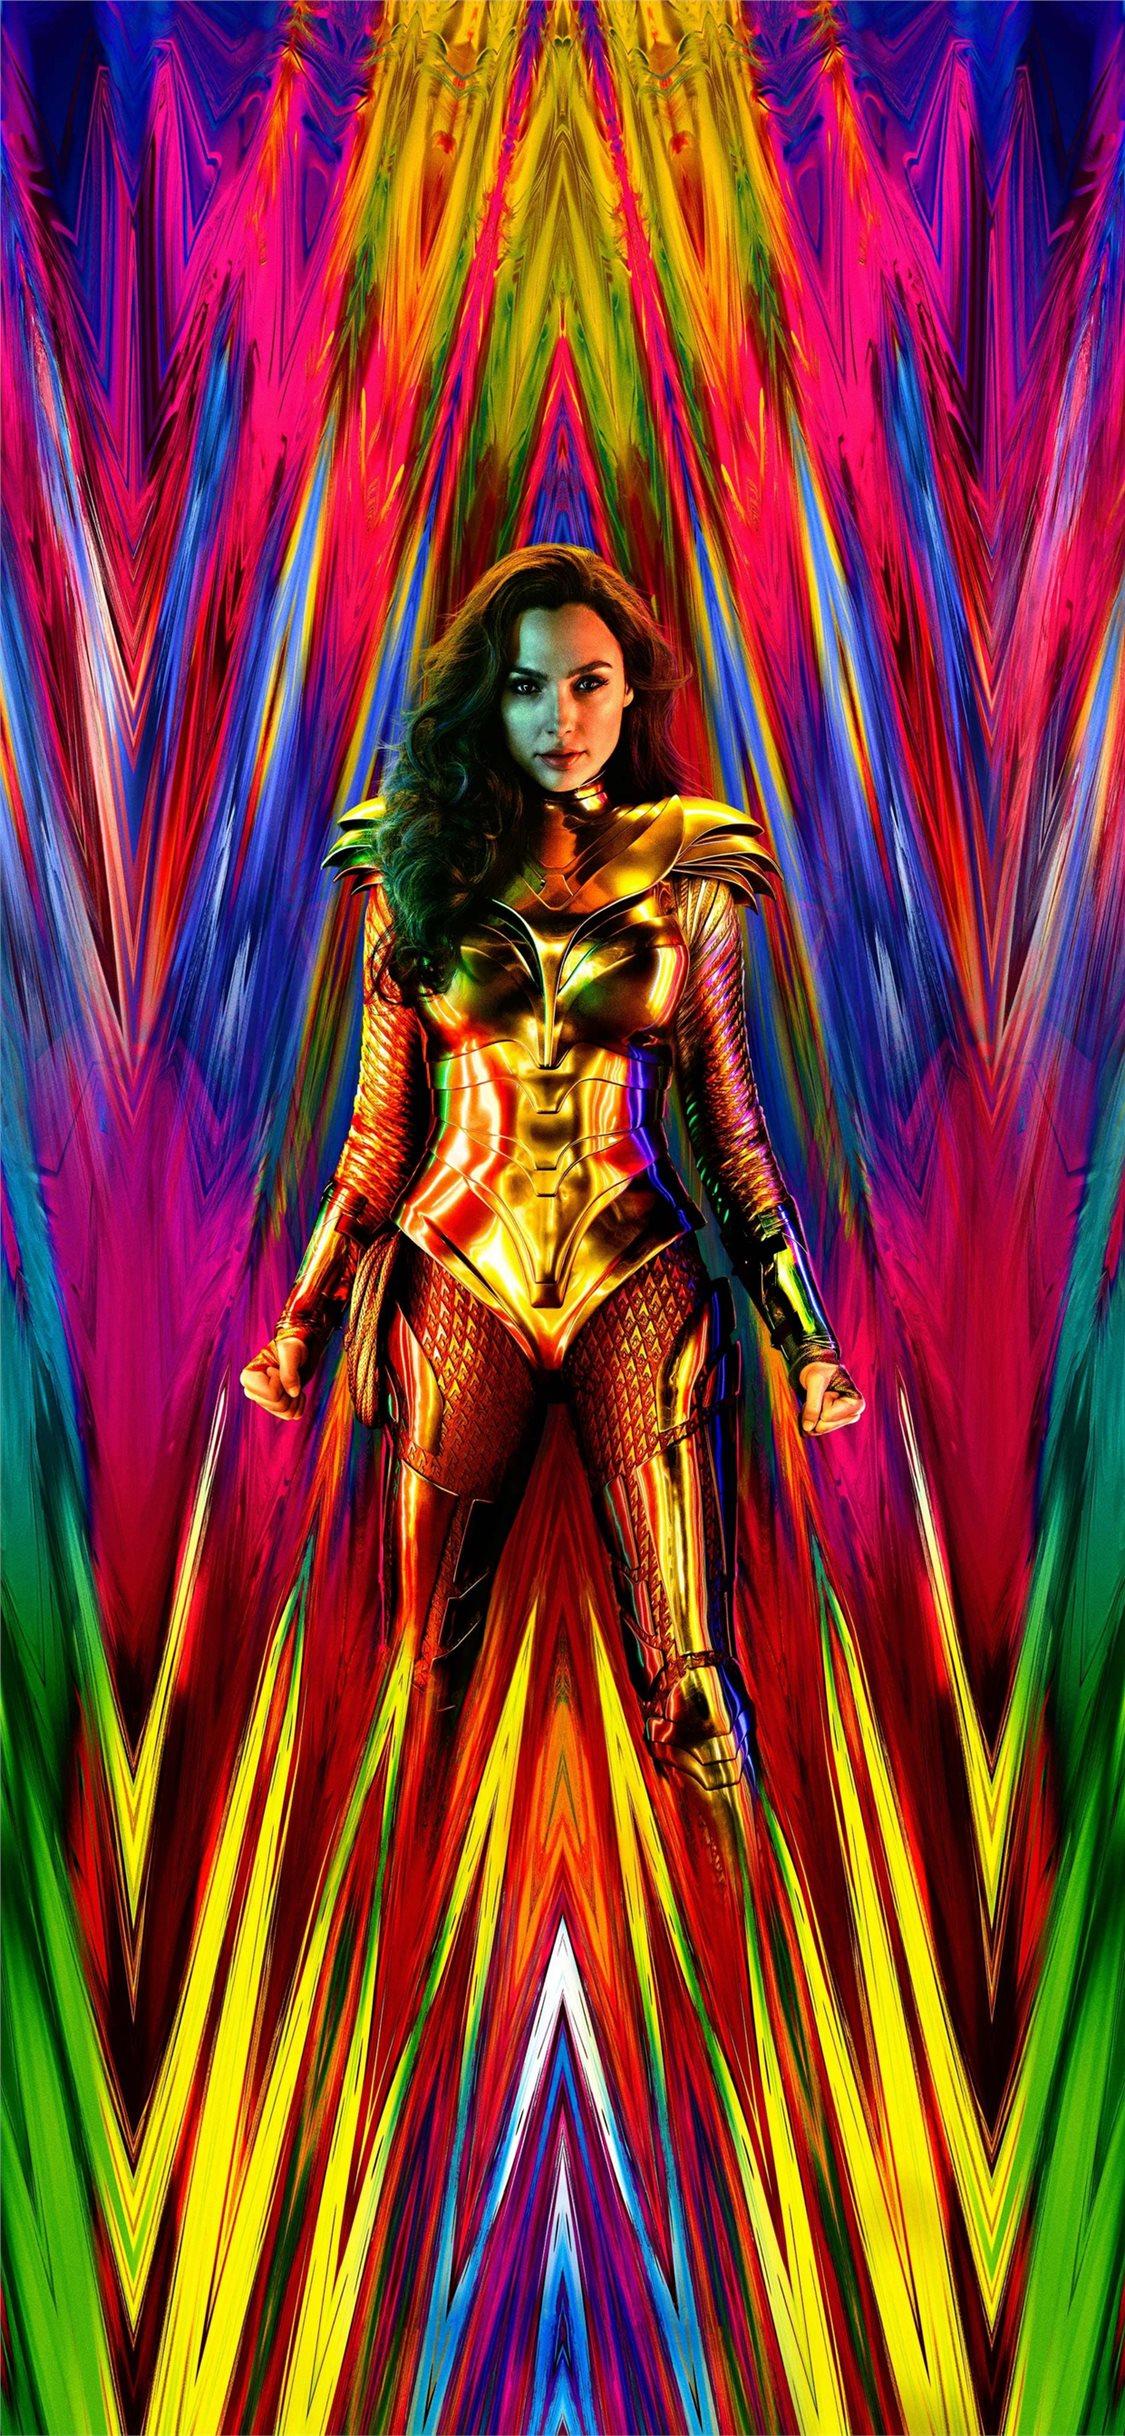 Wonder Woman 1984 4k Iphone X Wallpapers Free Download